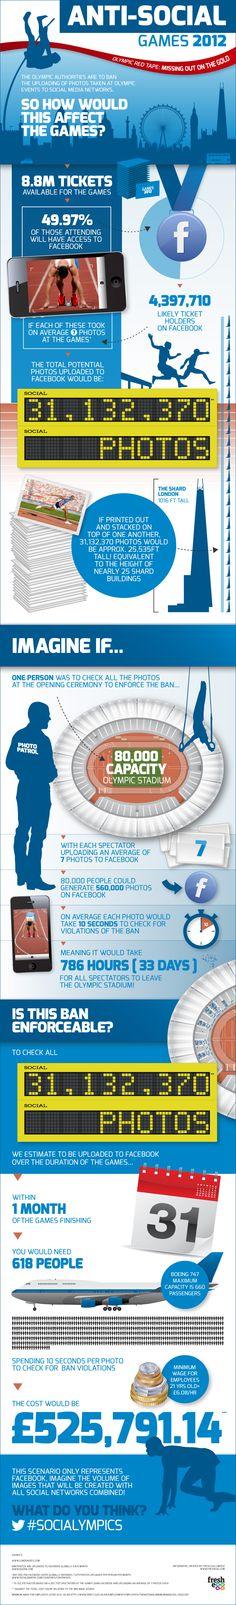 fresh eggs, the game, social media marketing, london, sports, antisoci game, olympic games, game 2012, medium